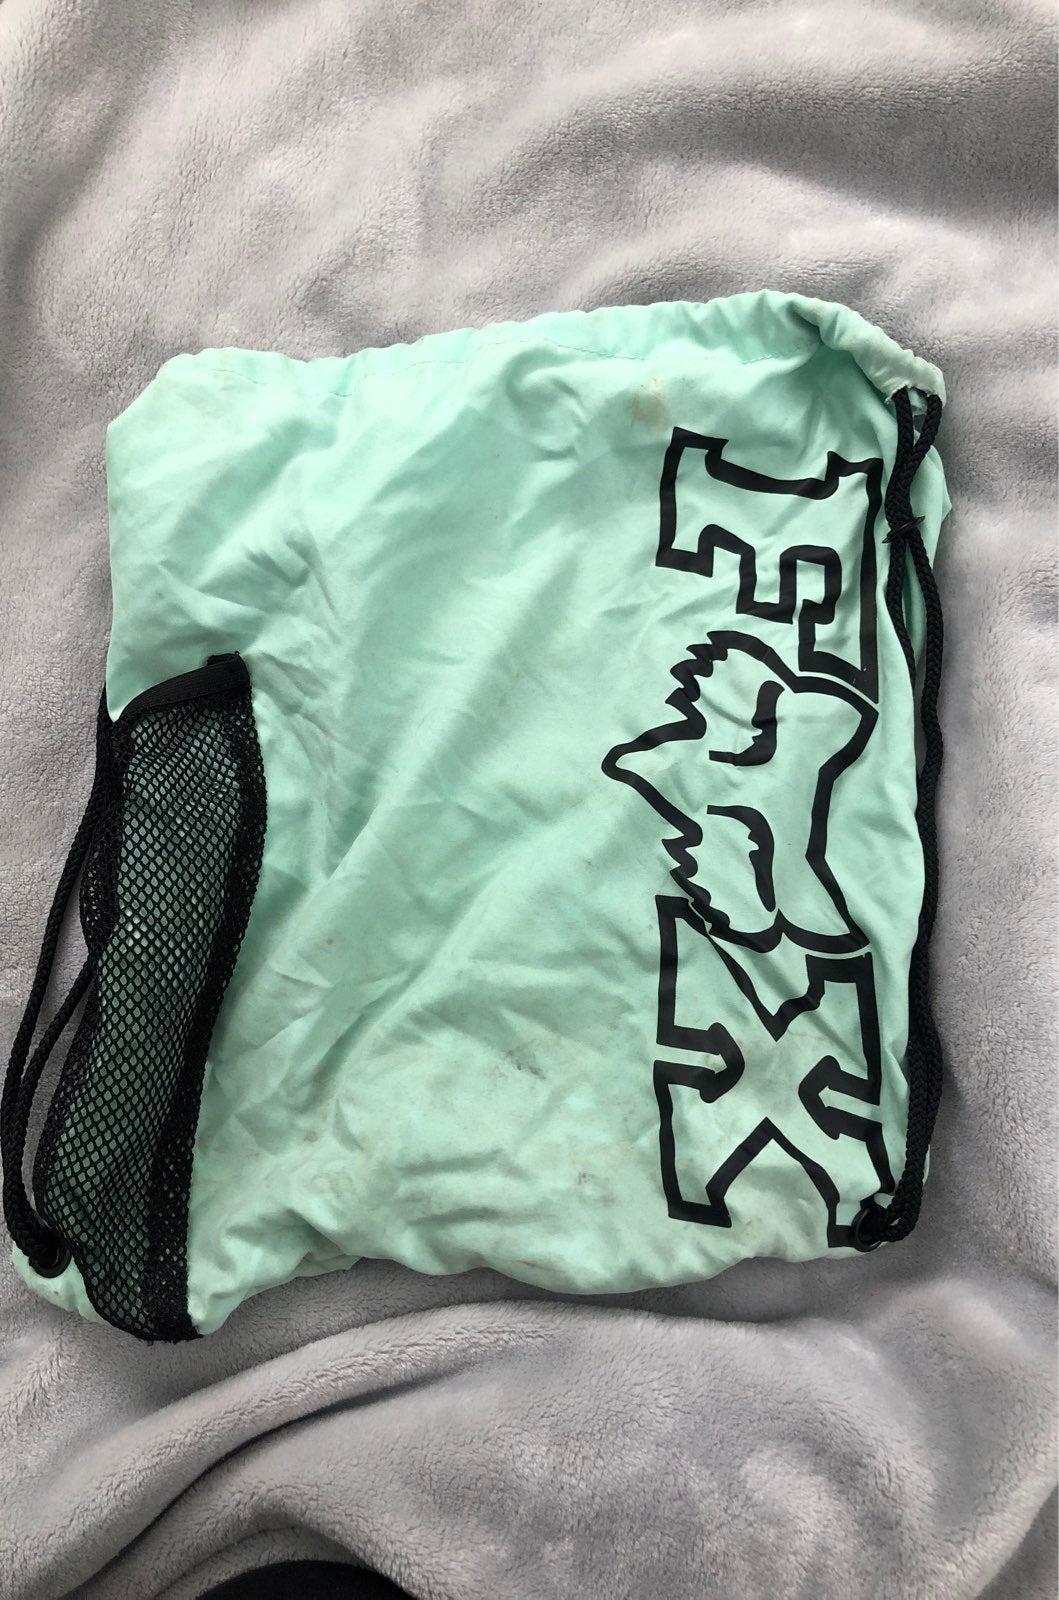 FOX racing bag